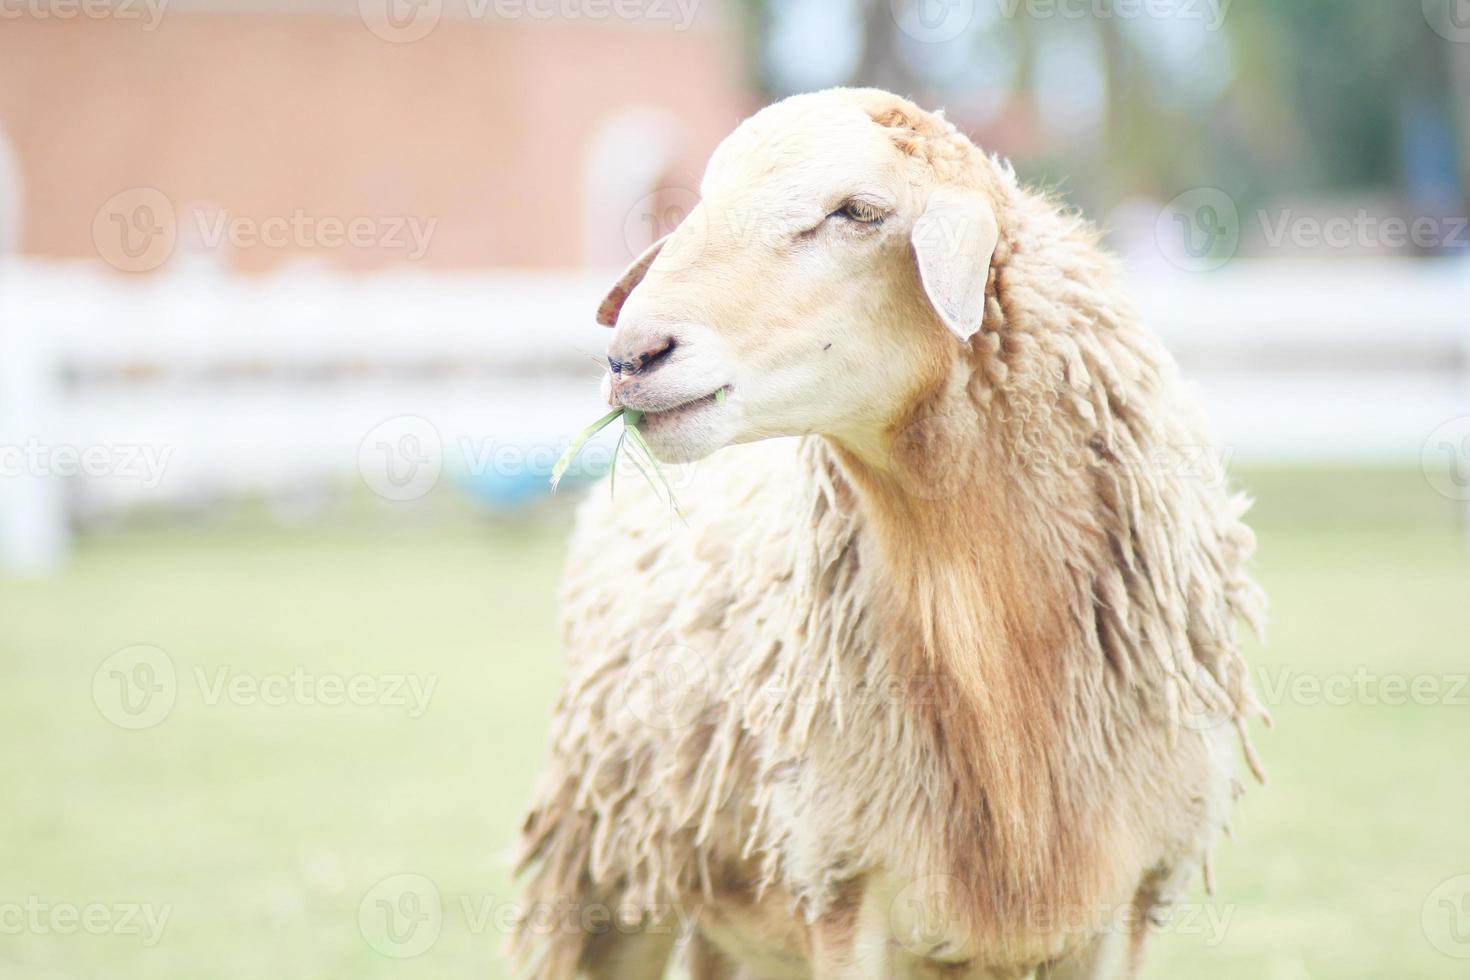 le pecore all'azienda agricola di ratchaburi, ratchaburi Tailandia foto